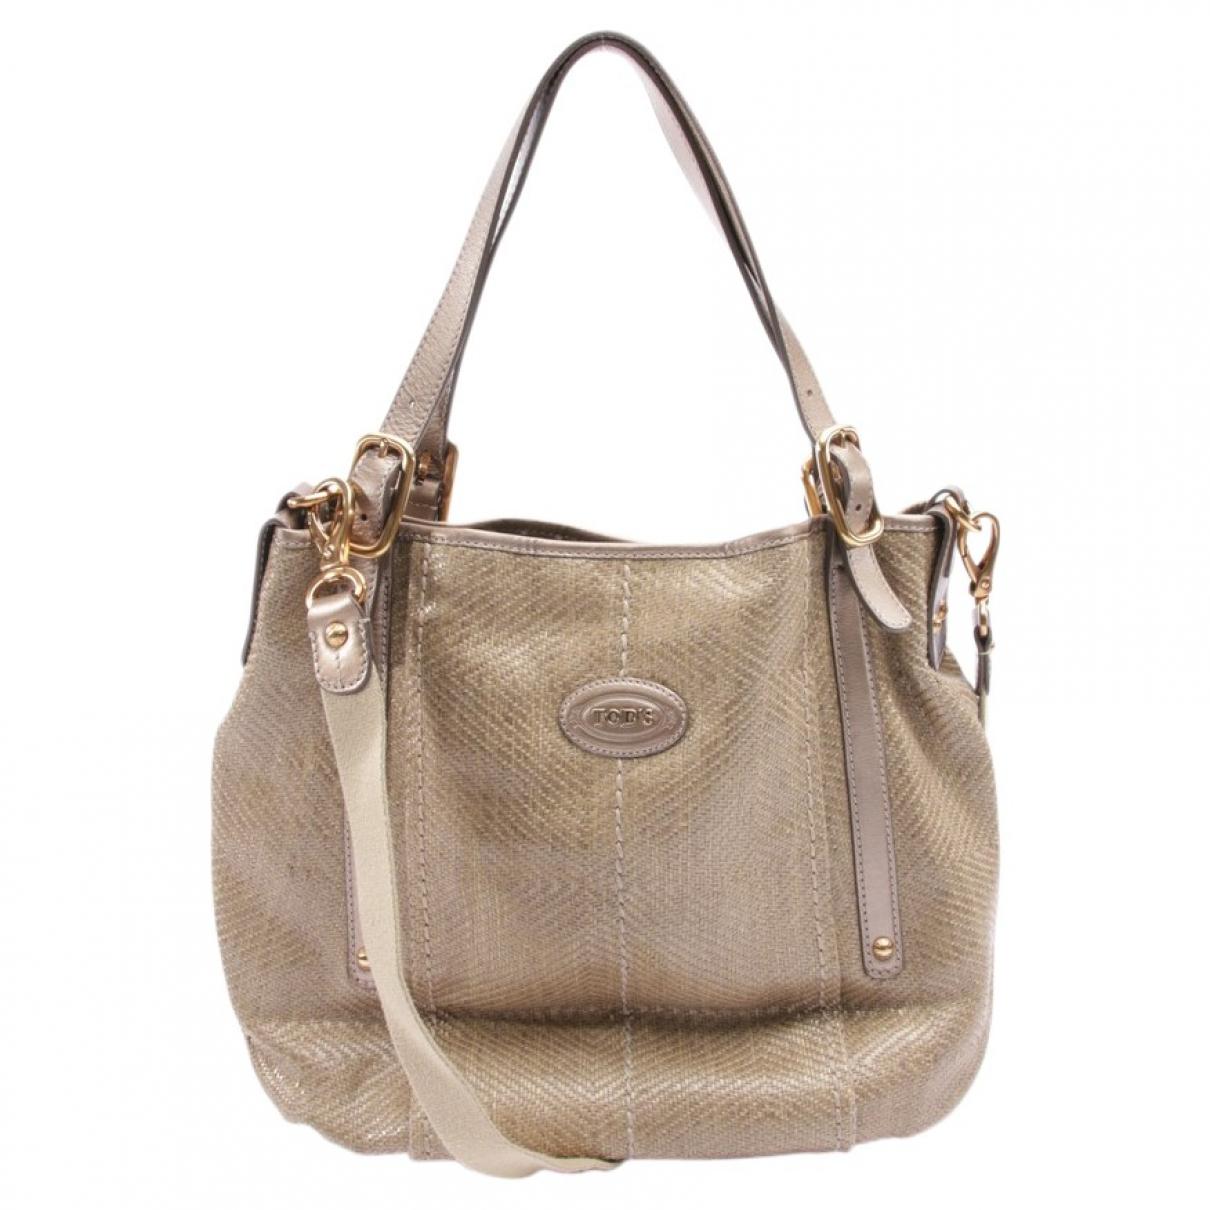 Tod's \N Beige Cotton handbag for Women \N